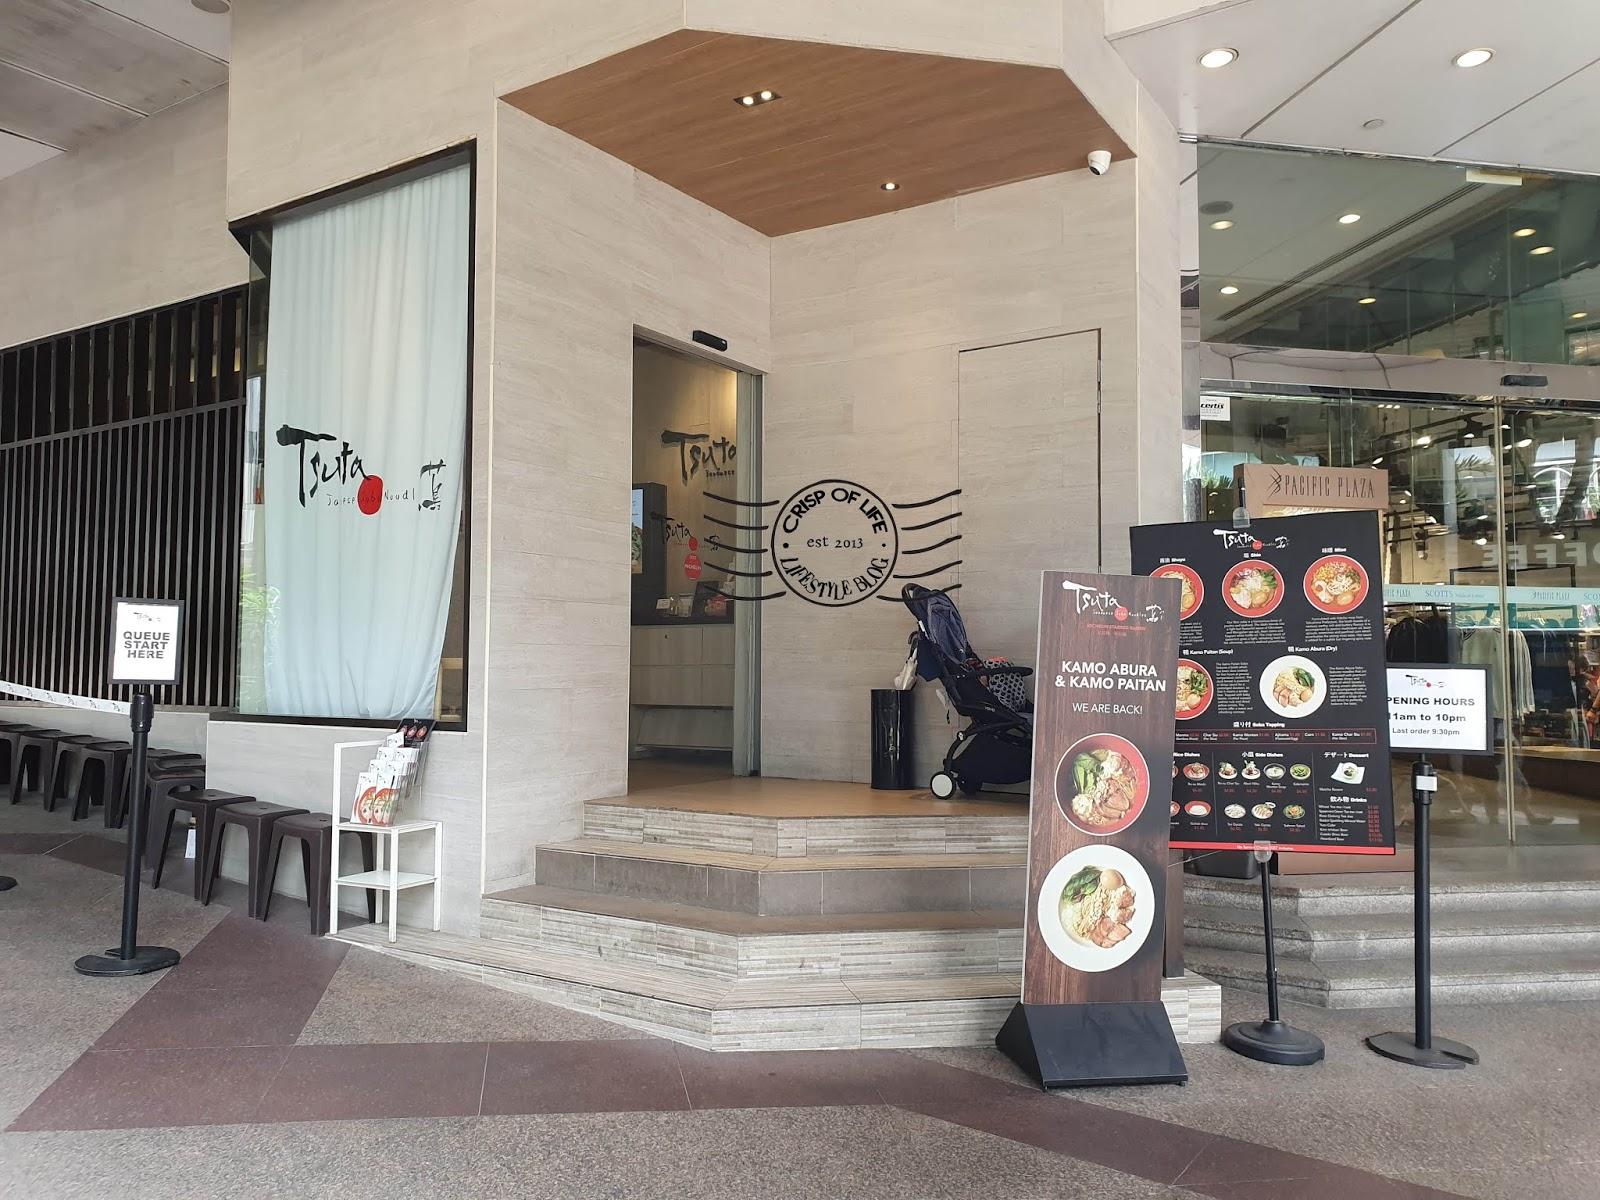 Tsuta The World's First Michelin-starred Ramen with Truffle Oil @ Singapore